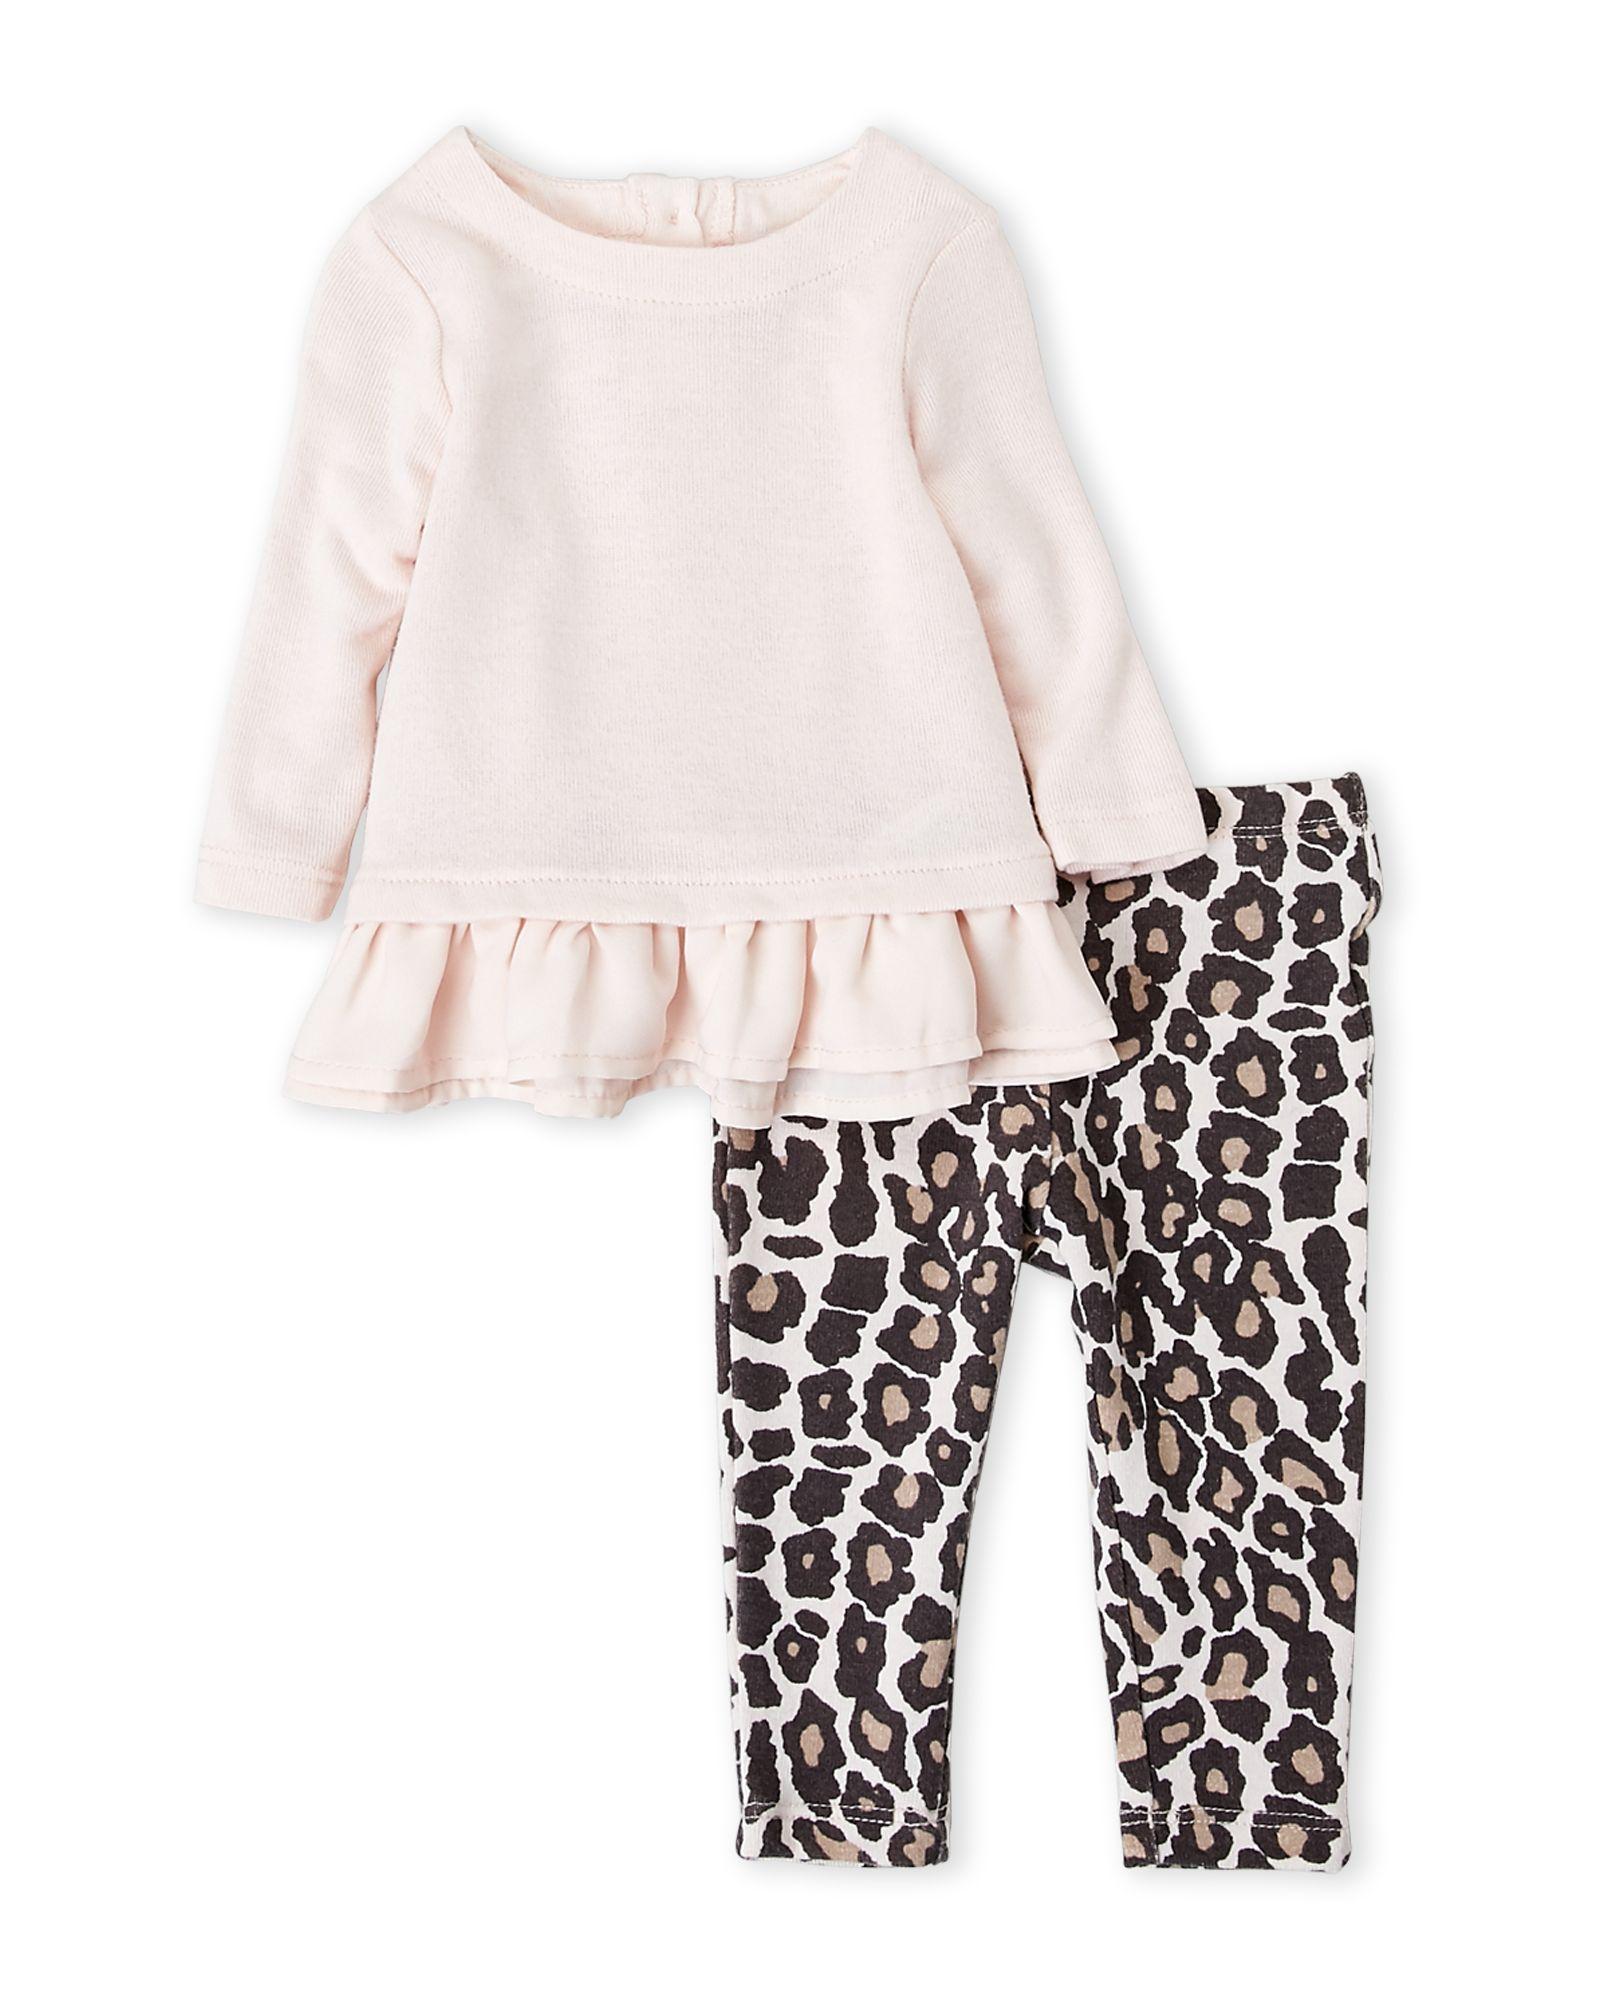 54108fc09a65c Splendid (Newborn/Infant Girls) Two-Piece Peplum Top & Leopard Leggings Set